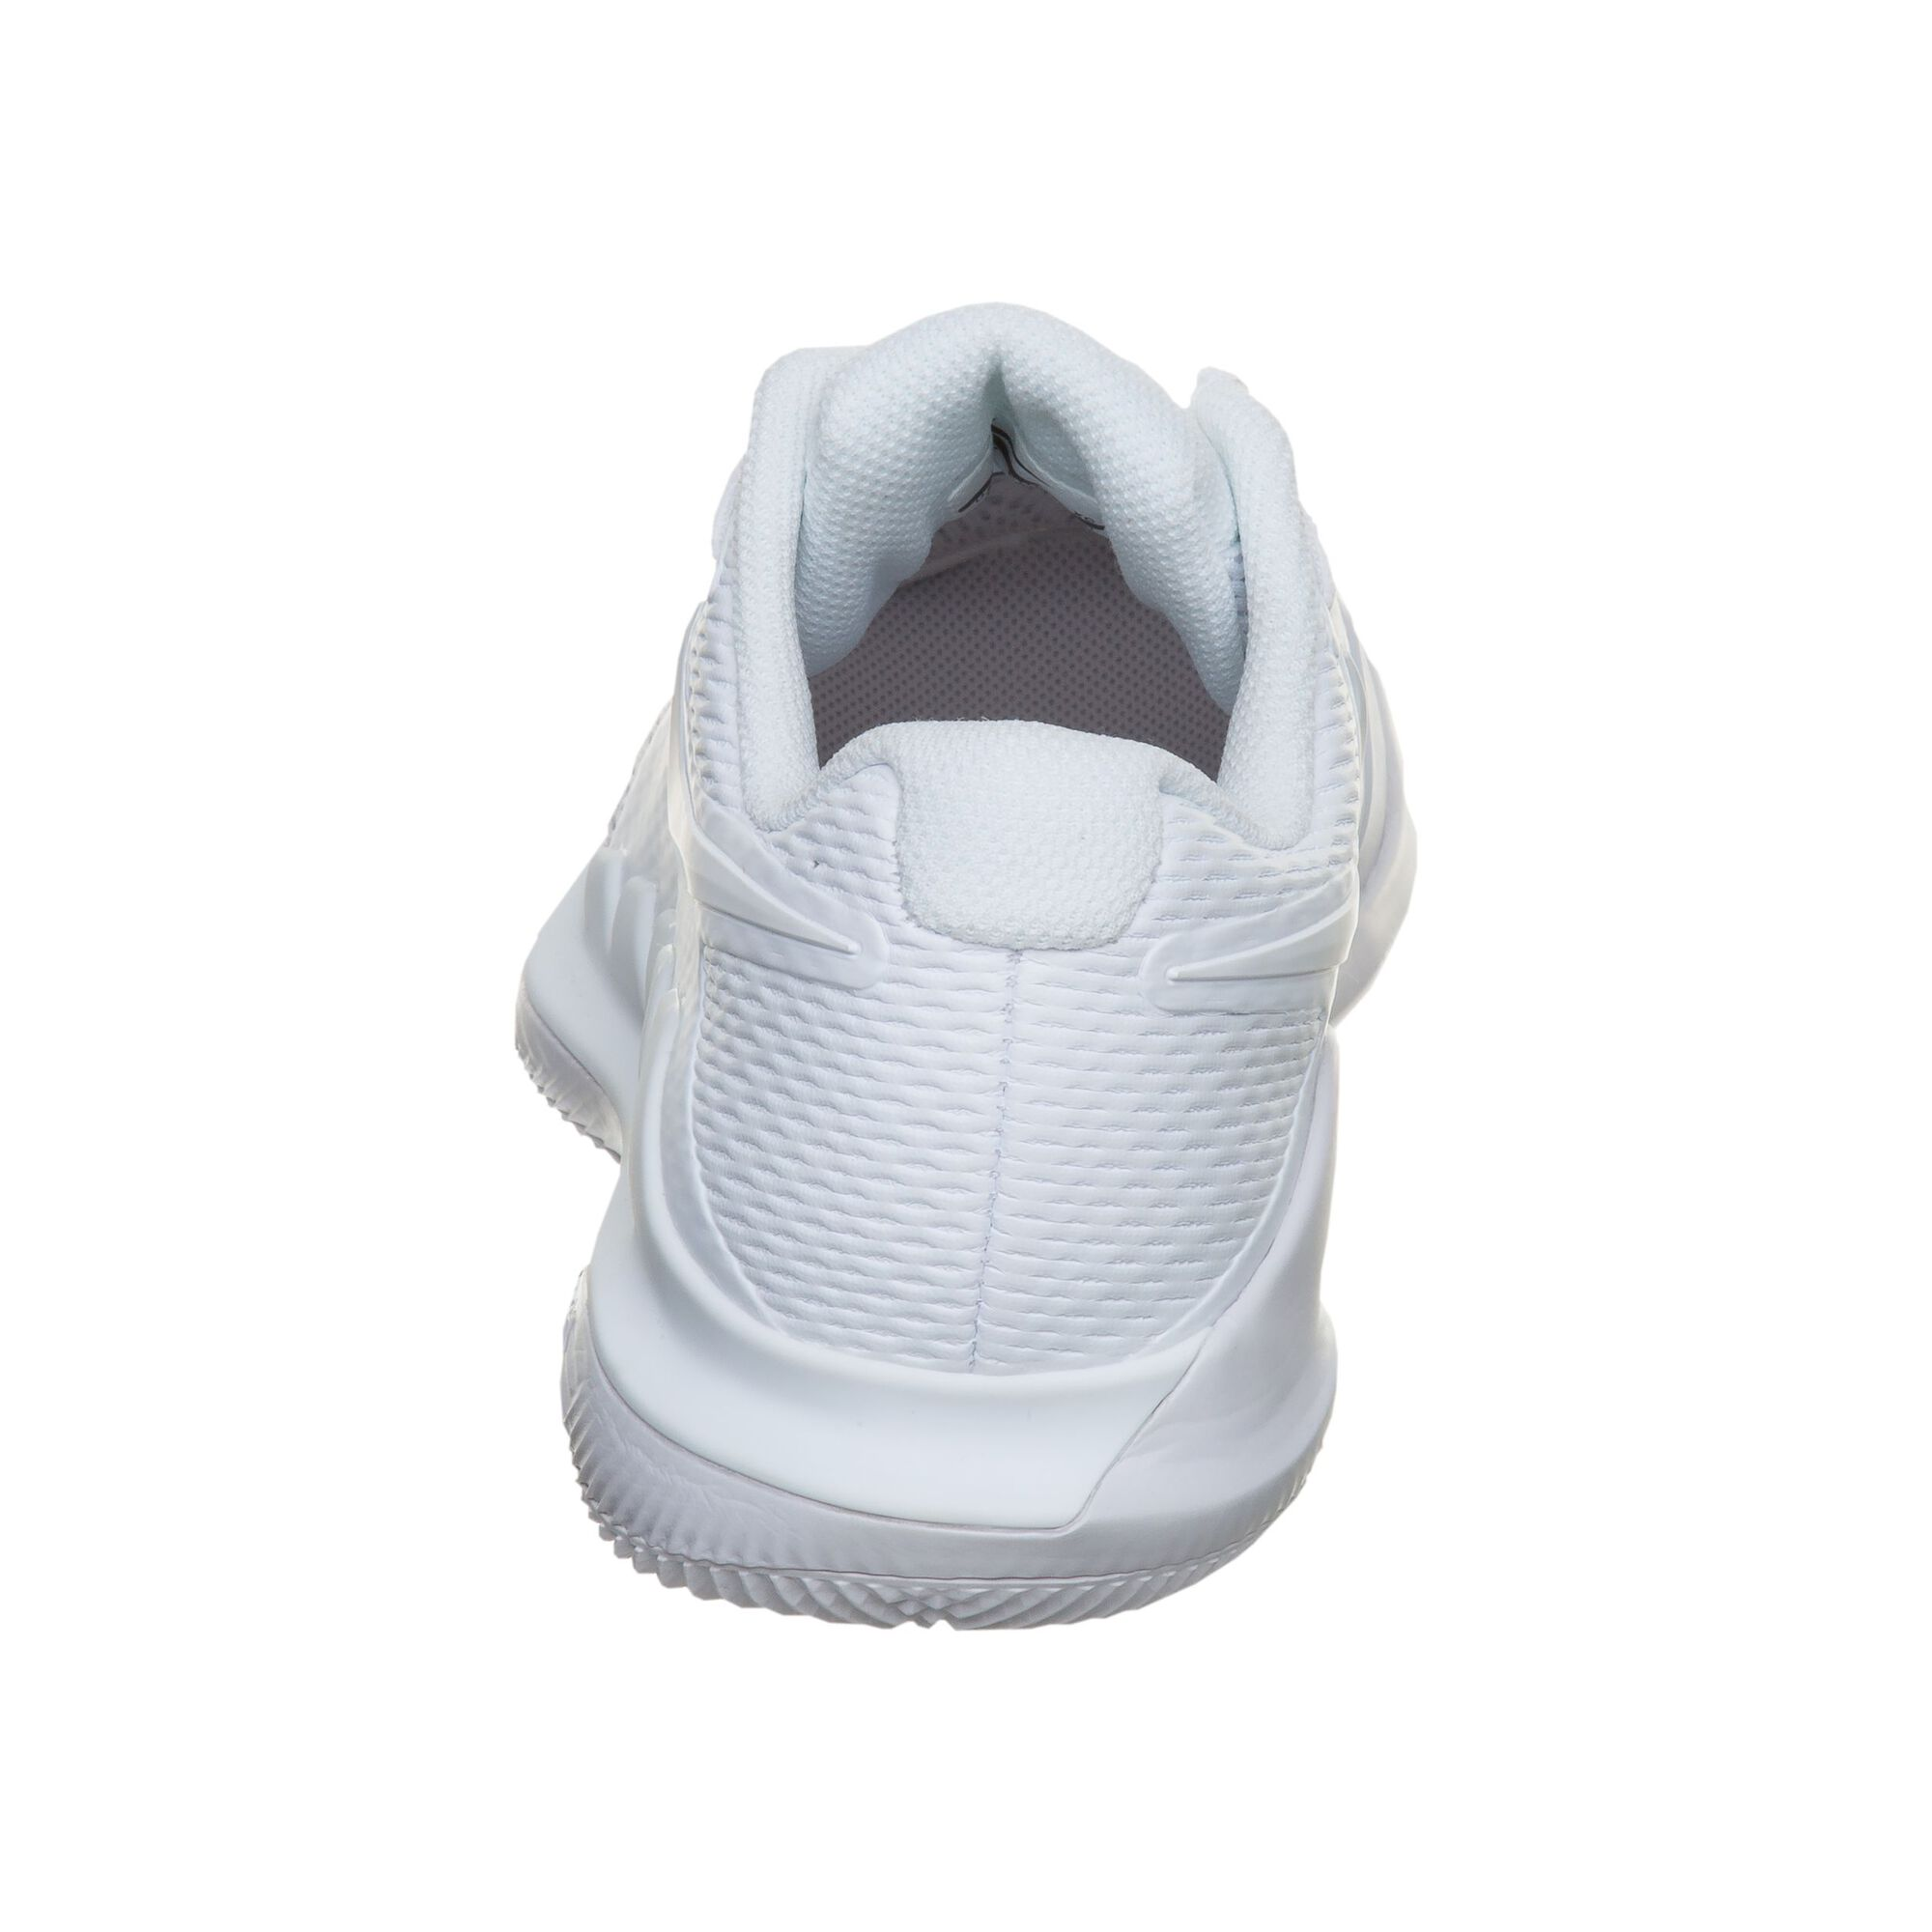 7efc9213 Nike; Nike; Nike; Nike; Nike; Nike; Nike; Nike; Nike; Nike. Air Zoom Vapor X  ...